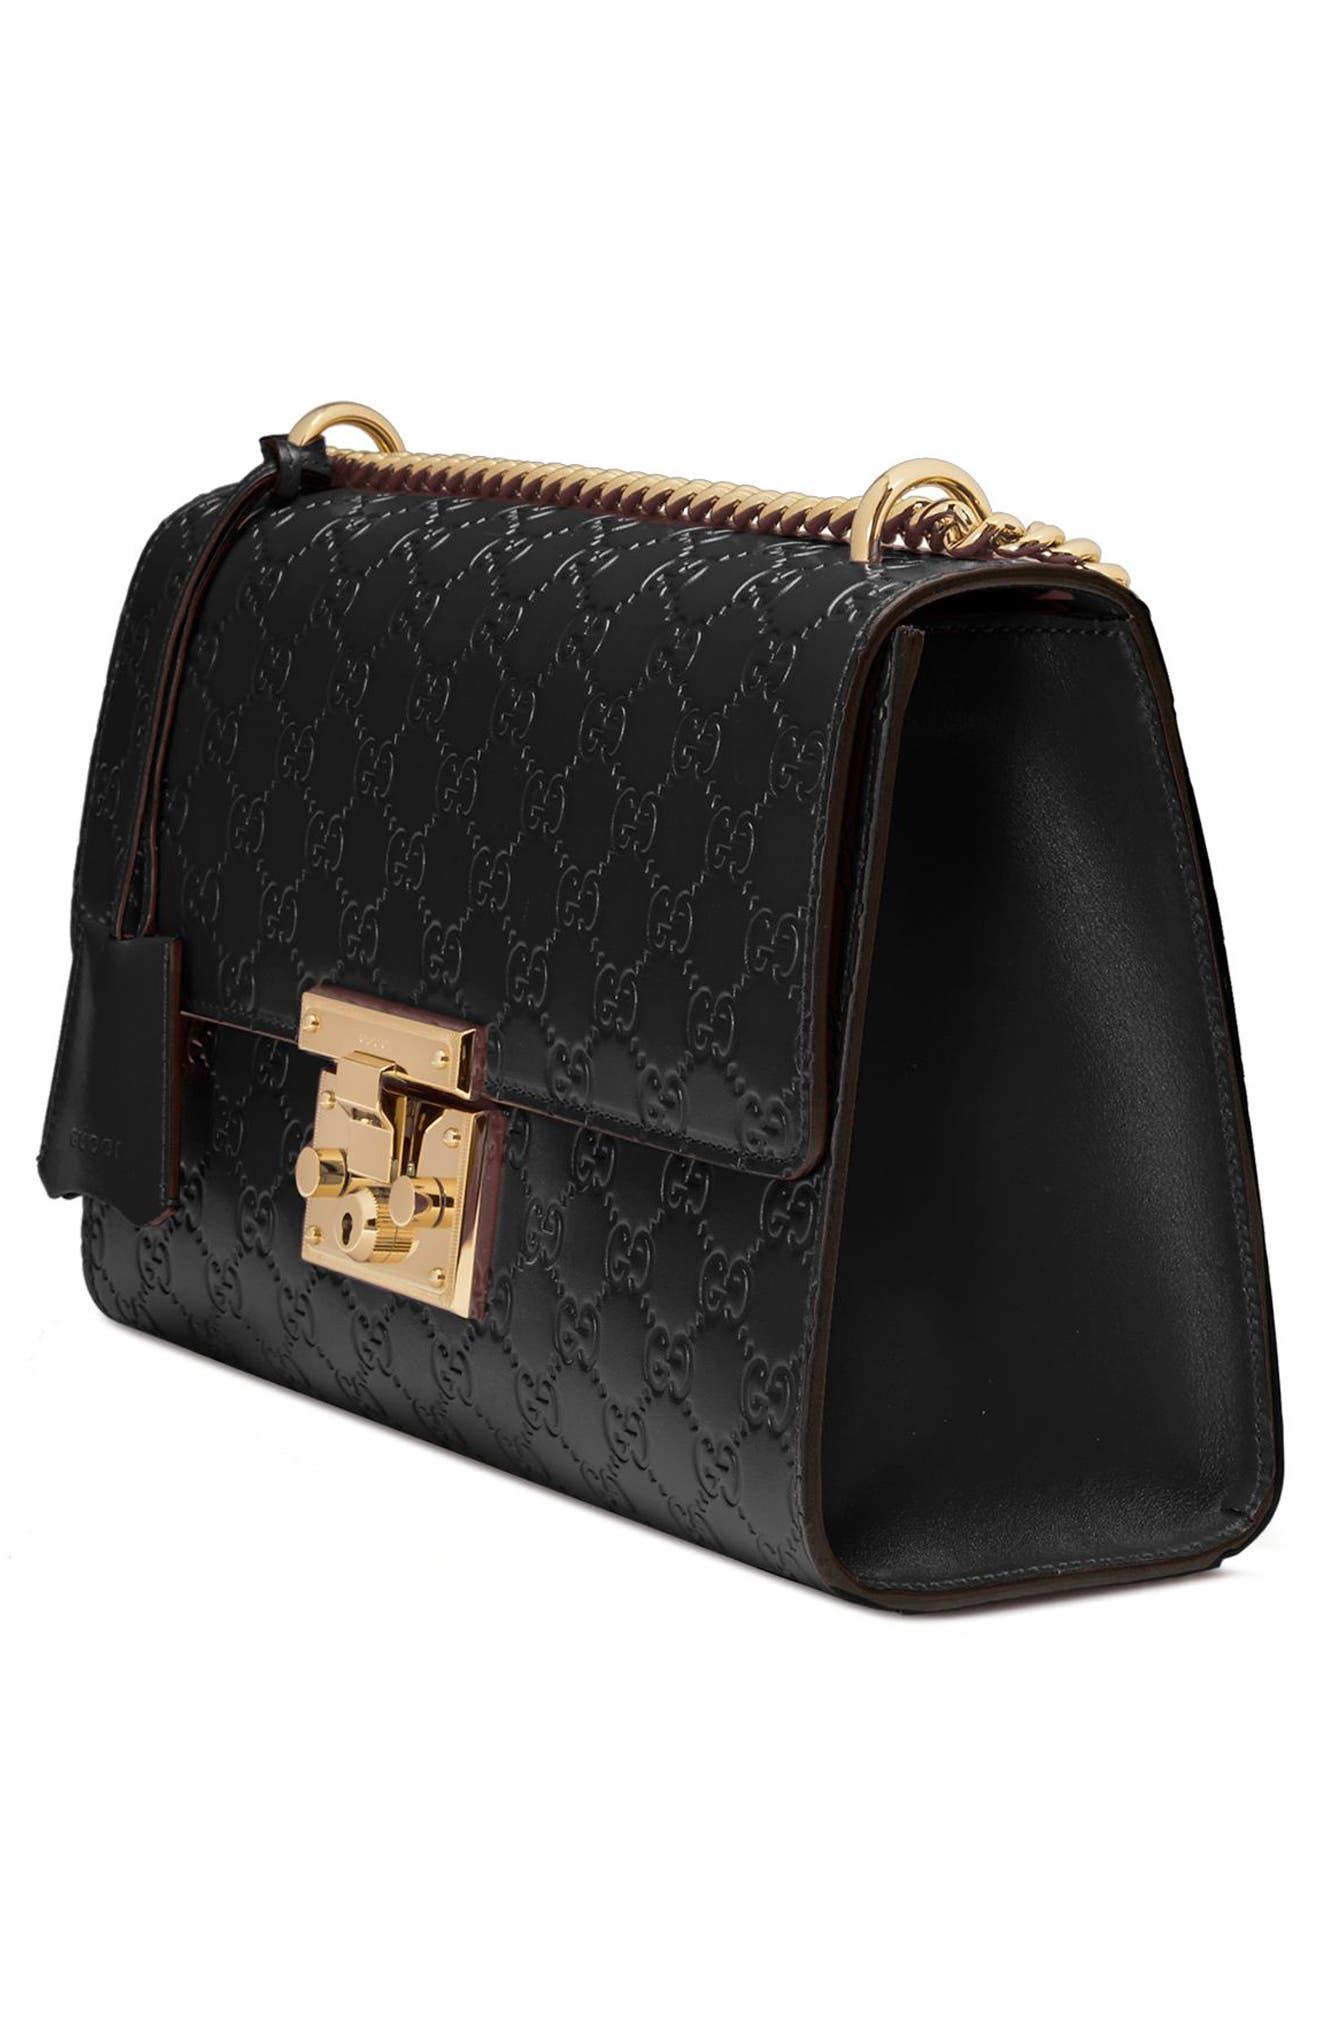 Medium Padlock Signature Leather Shoulder Bag,                             Alternate thumbnail 4, color,                             NERO